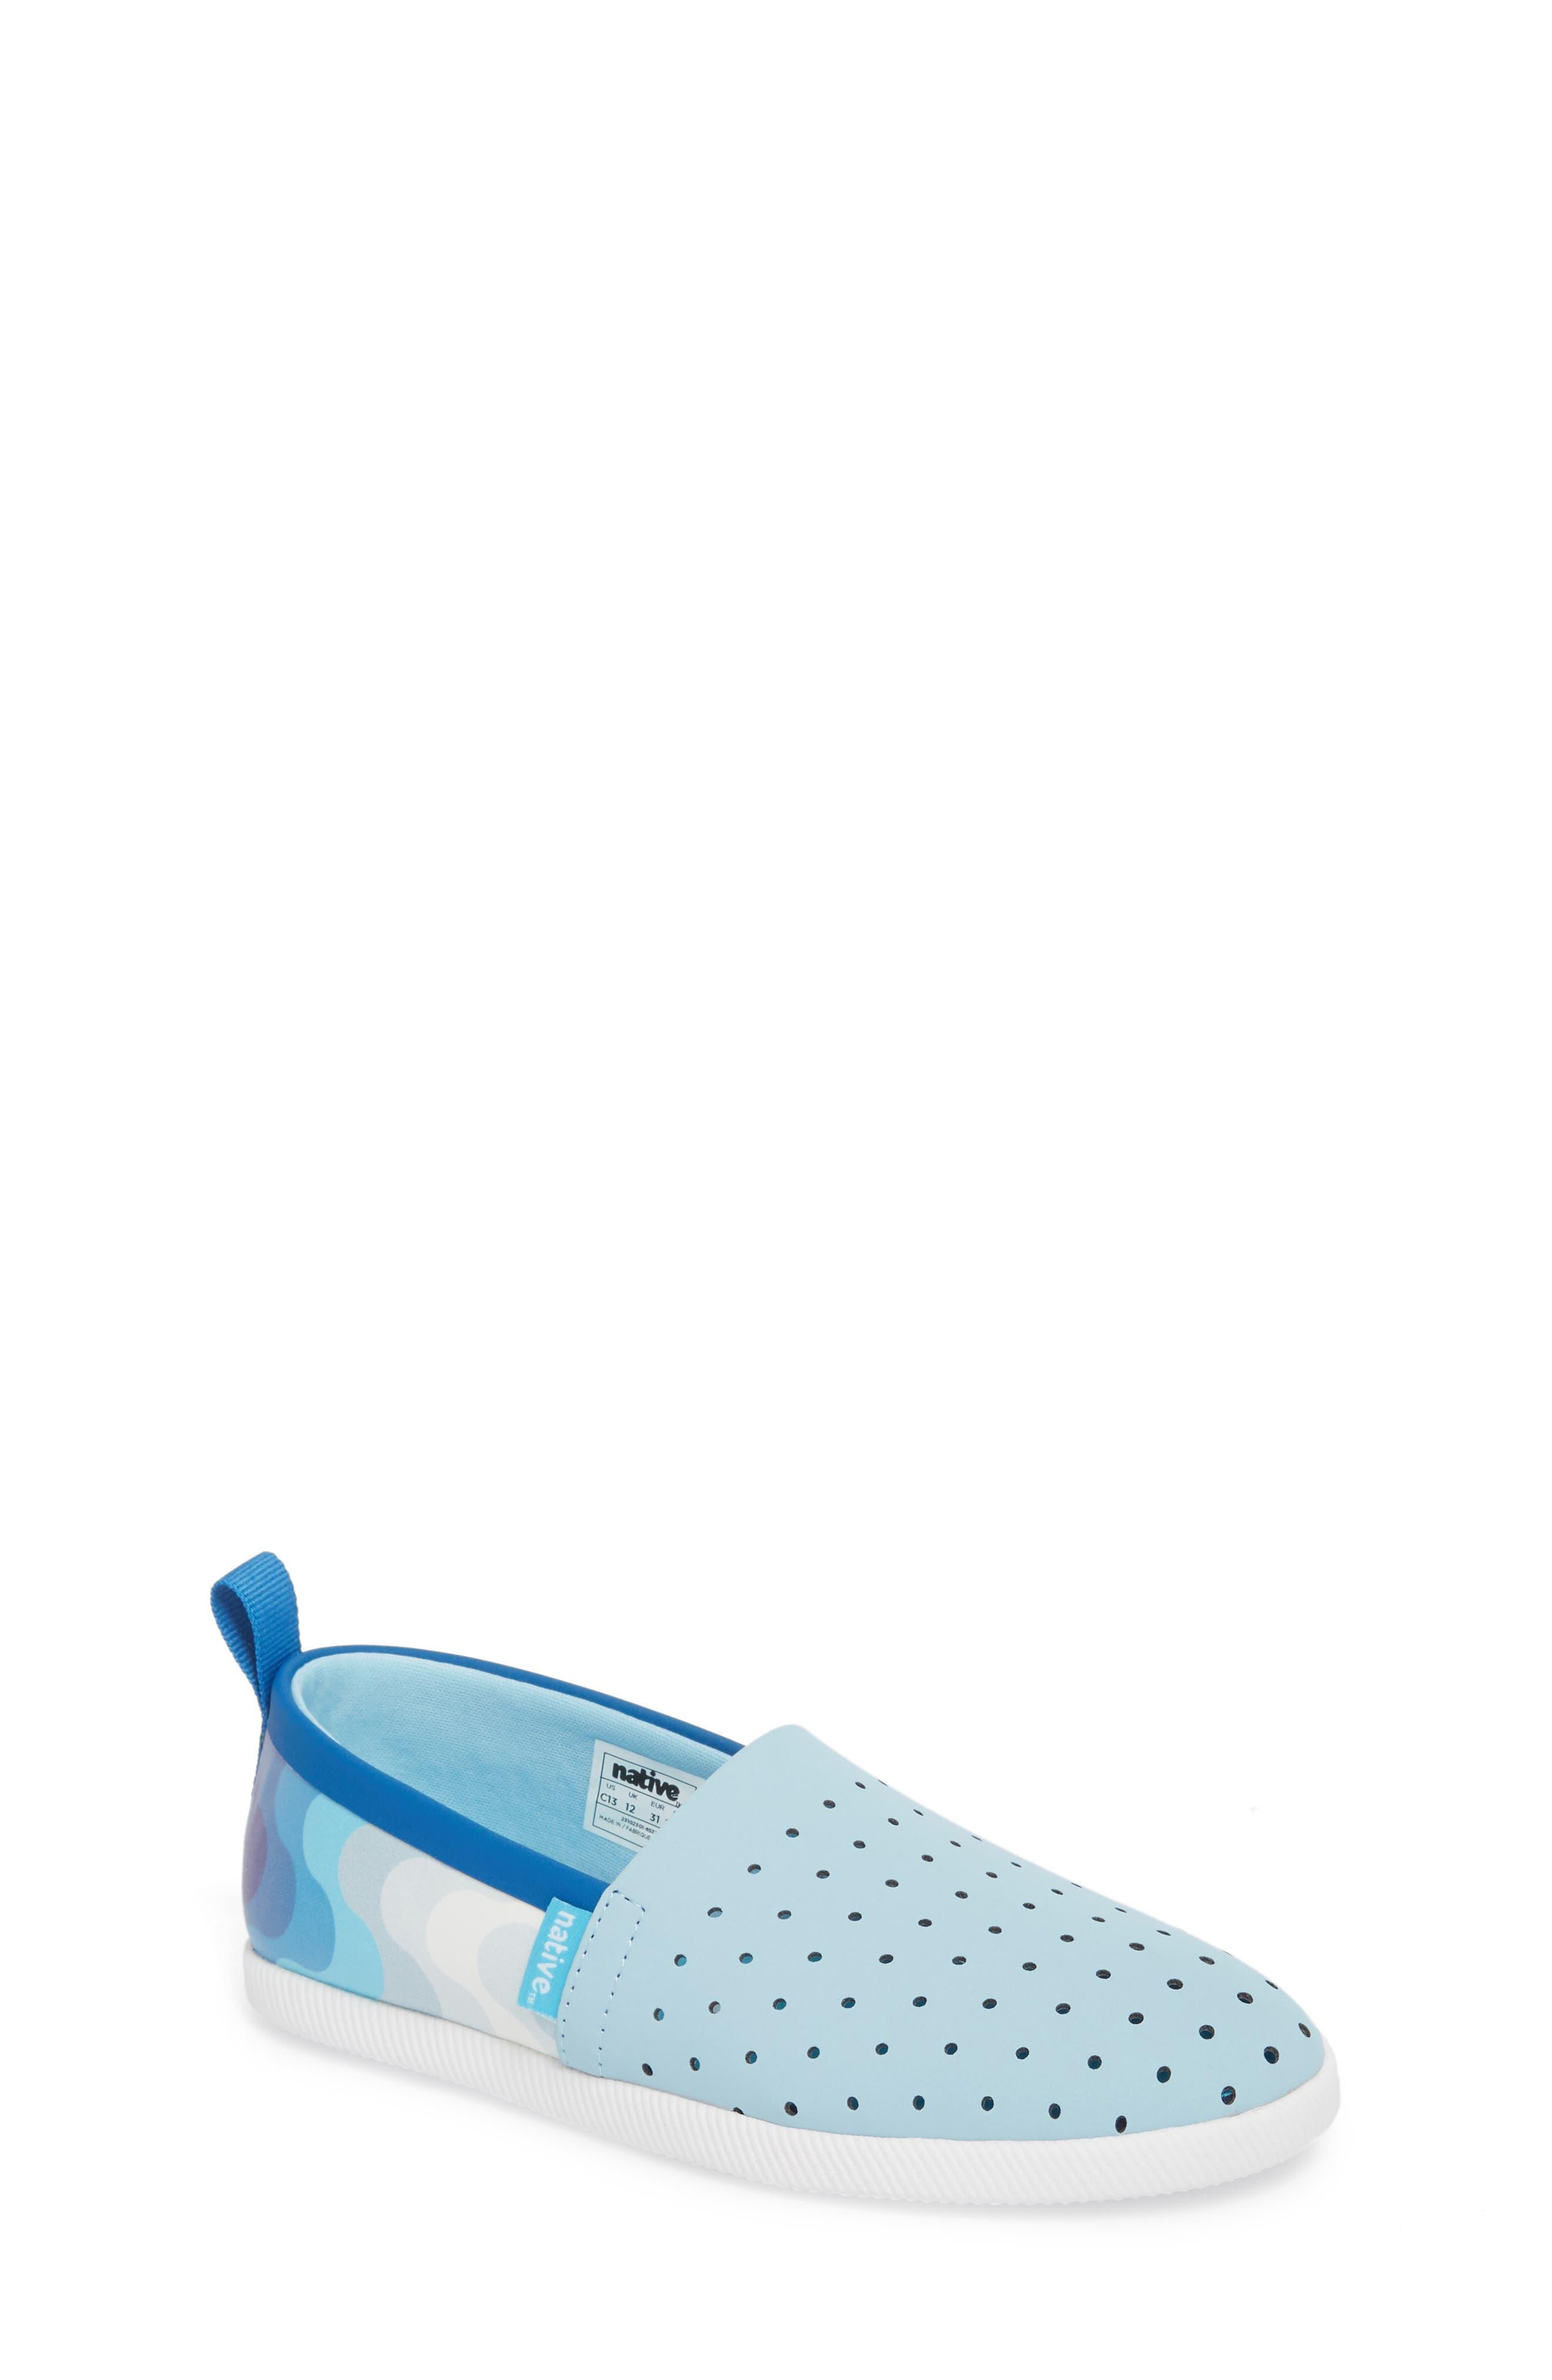 'Venice' Slip-On,                         Main,                         color, Sky Blue/ Shell White/ Wave